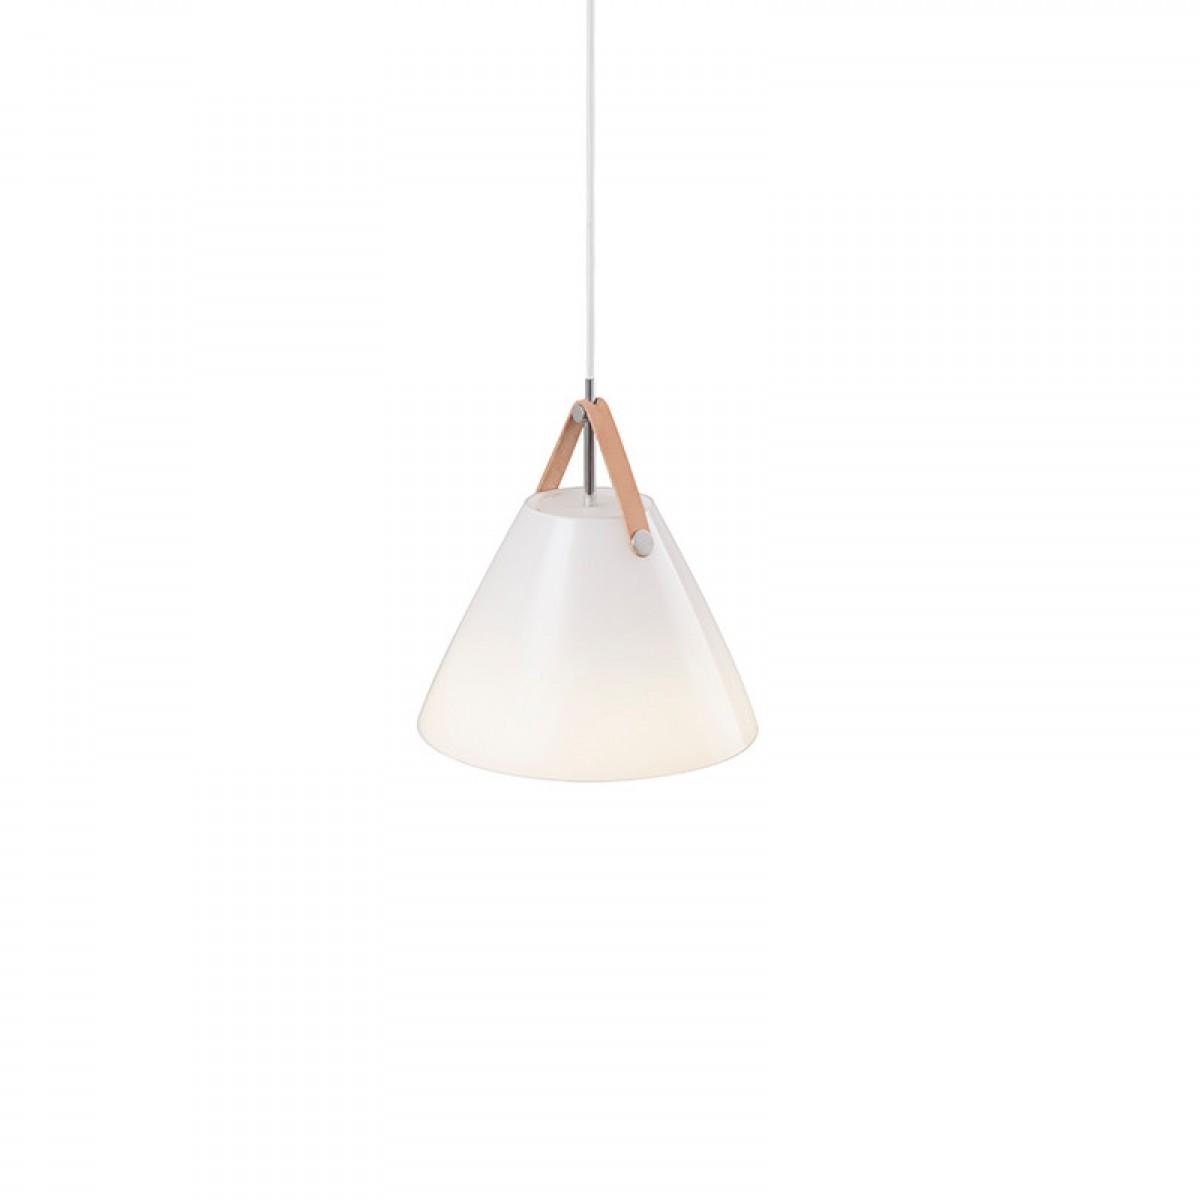 NORDLUX Strap 27 pendel opal glas / læder